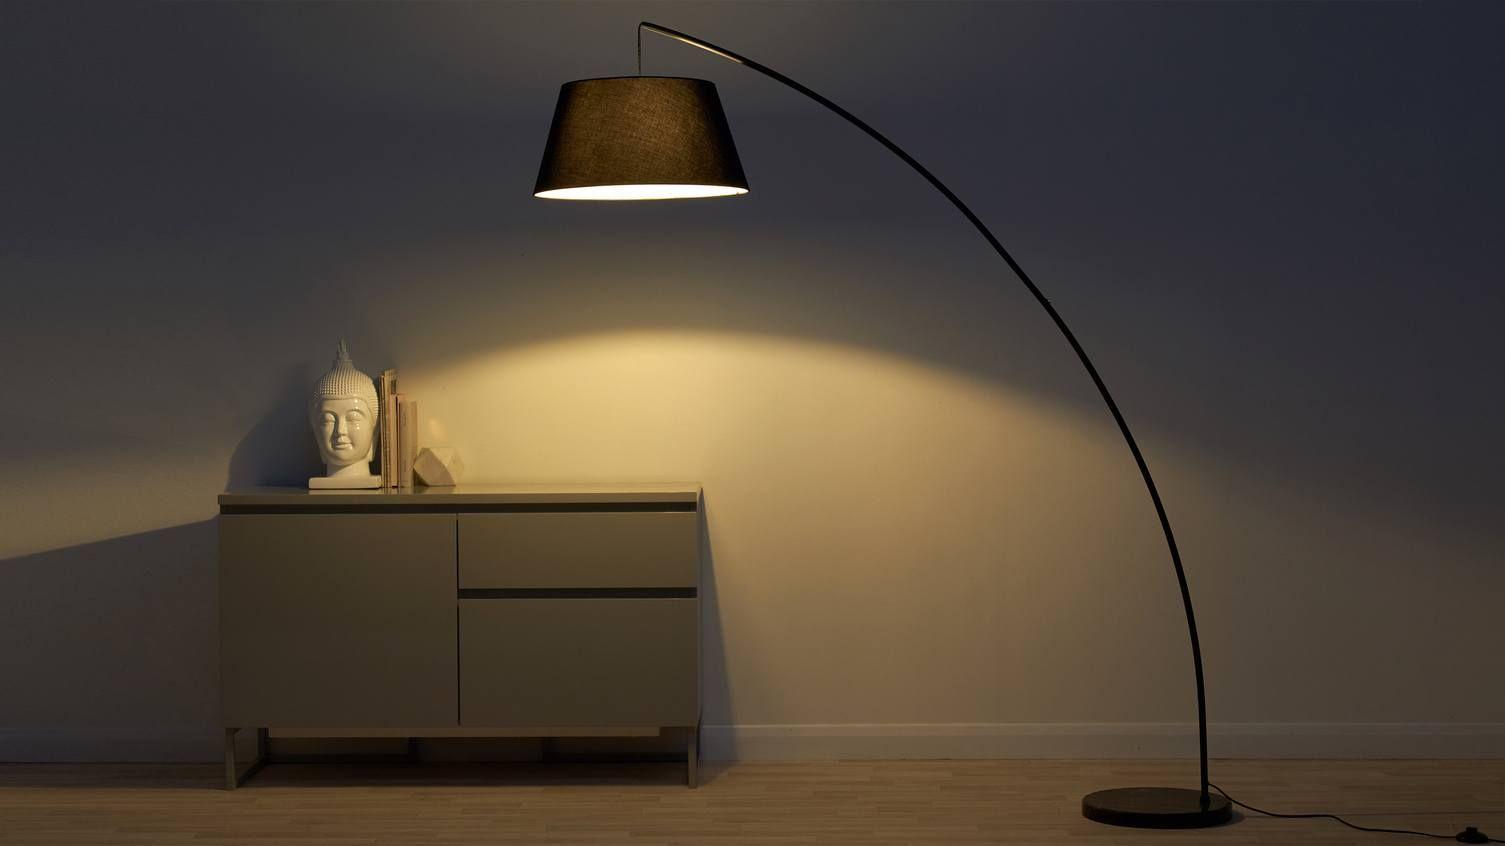 Rey Black Marble Arc Floor Lamp Floor Lamp Overarching Floor